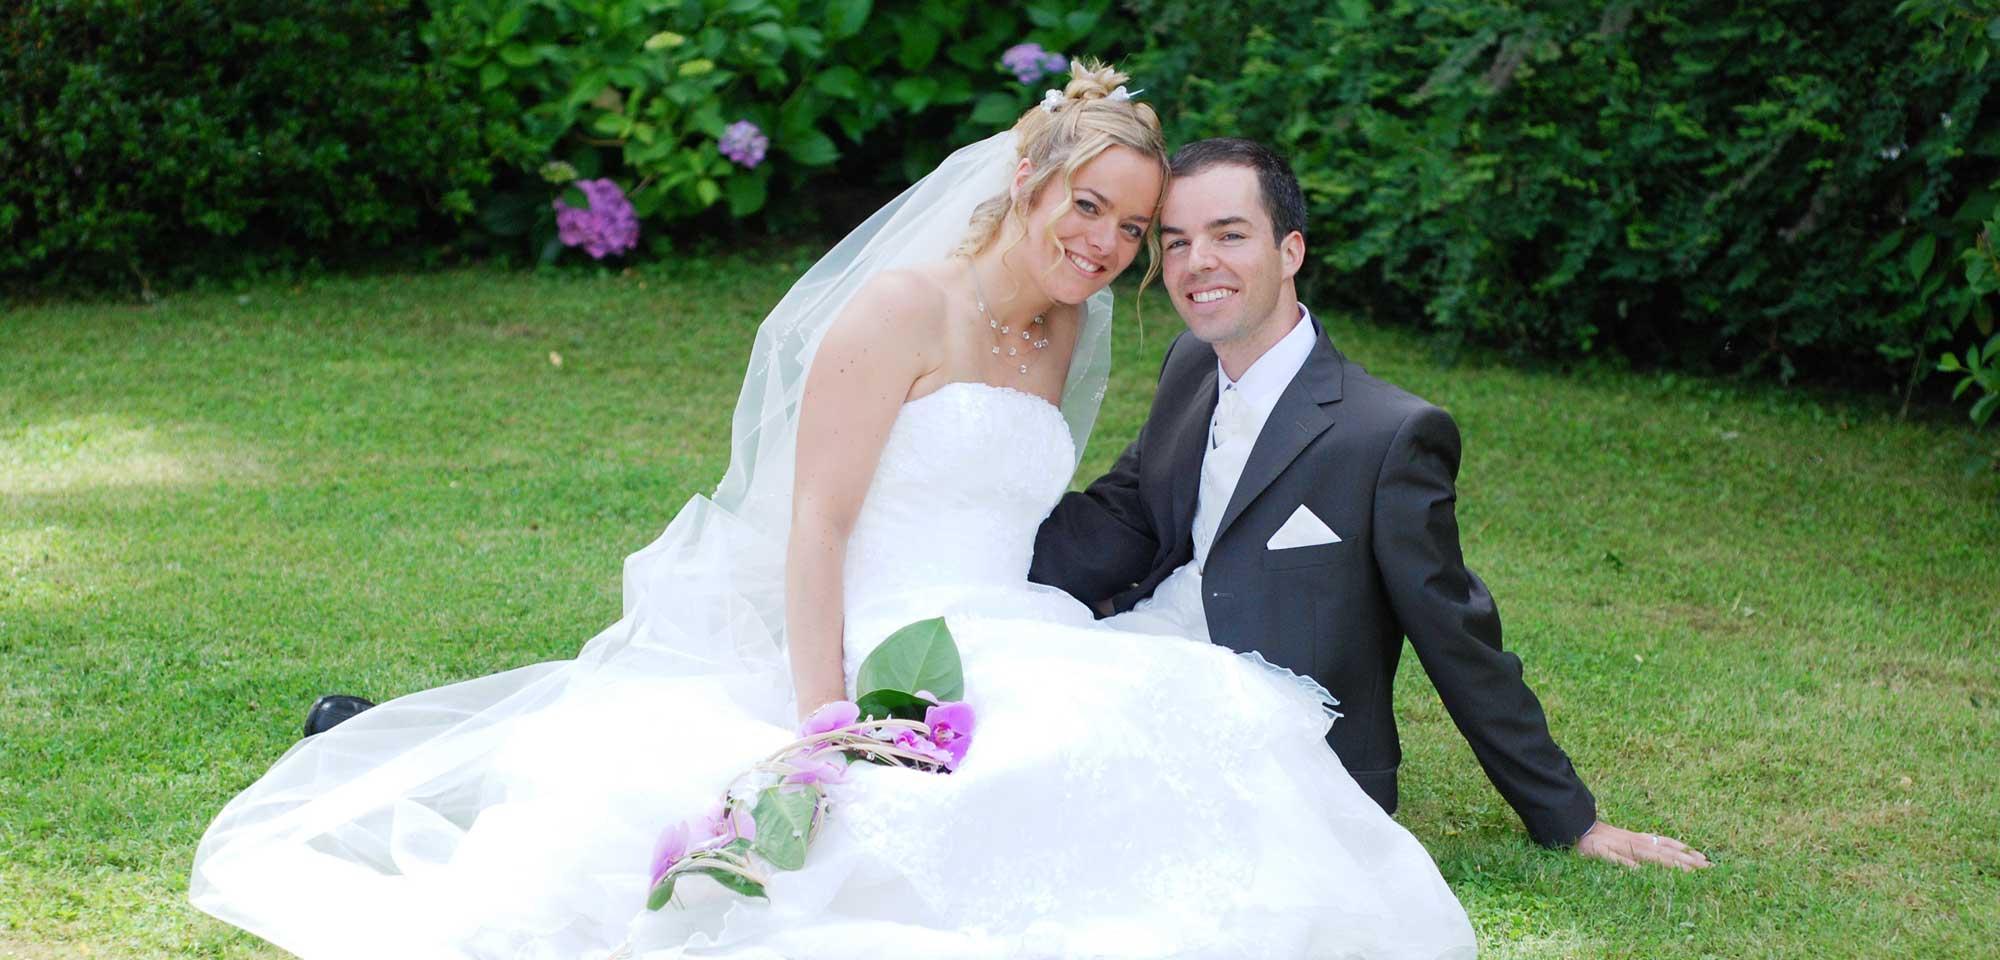 photographe mariage rennes pac ille et vilaine 35. Black Bedroom Furniture Sets. Home Design Ideas